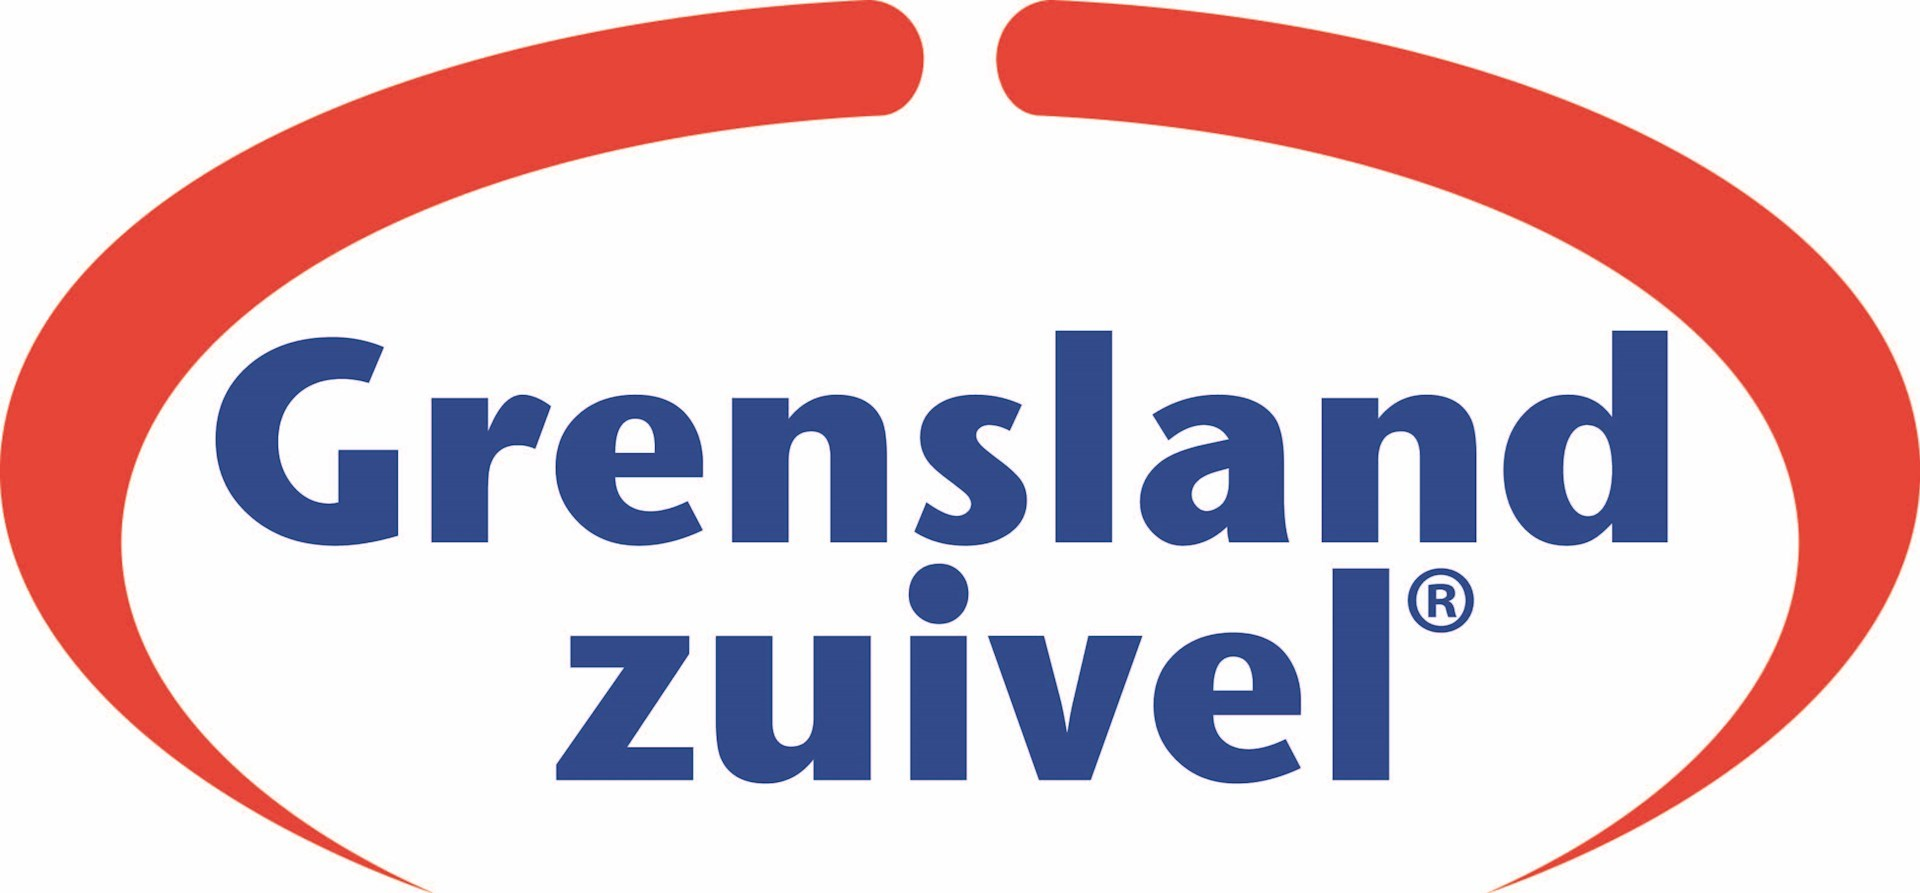 Merkafbeelding Grensland Zuivel